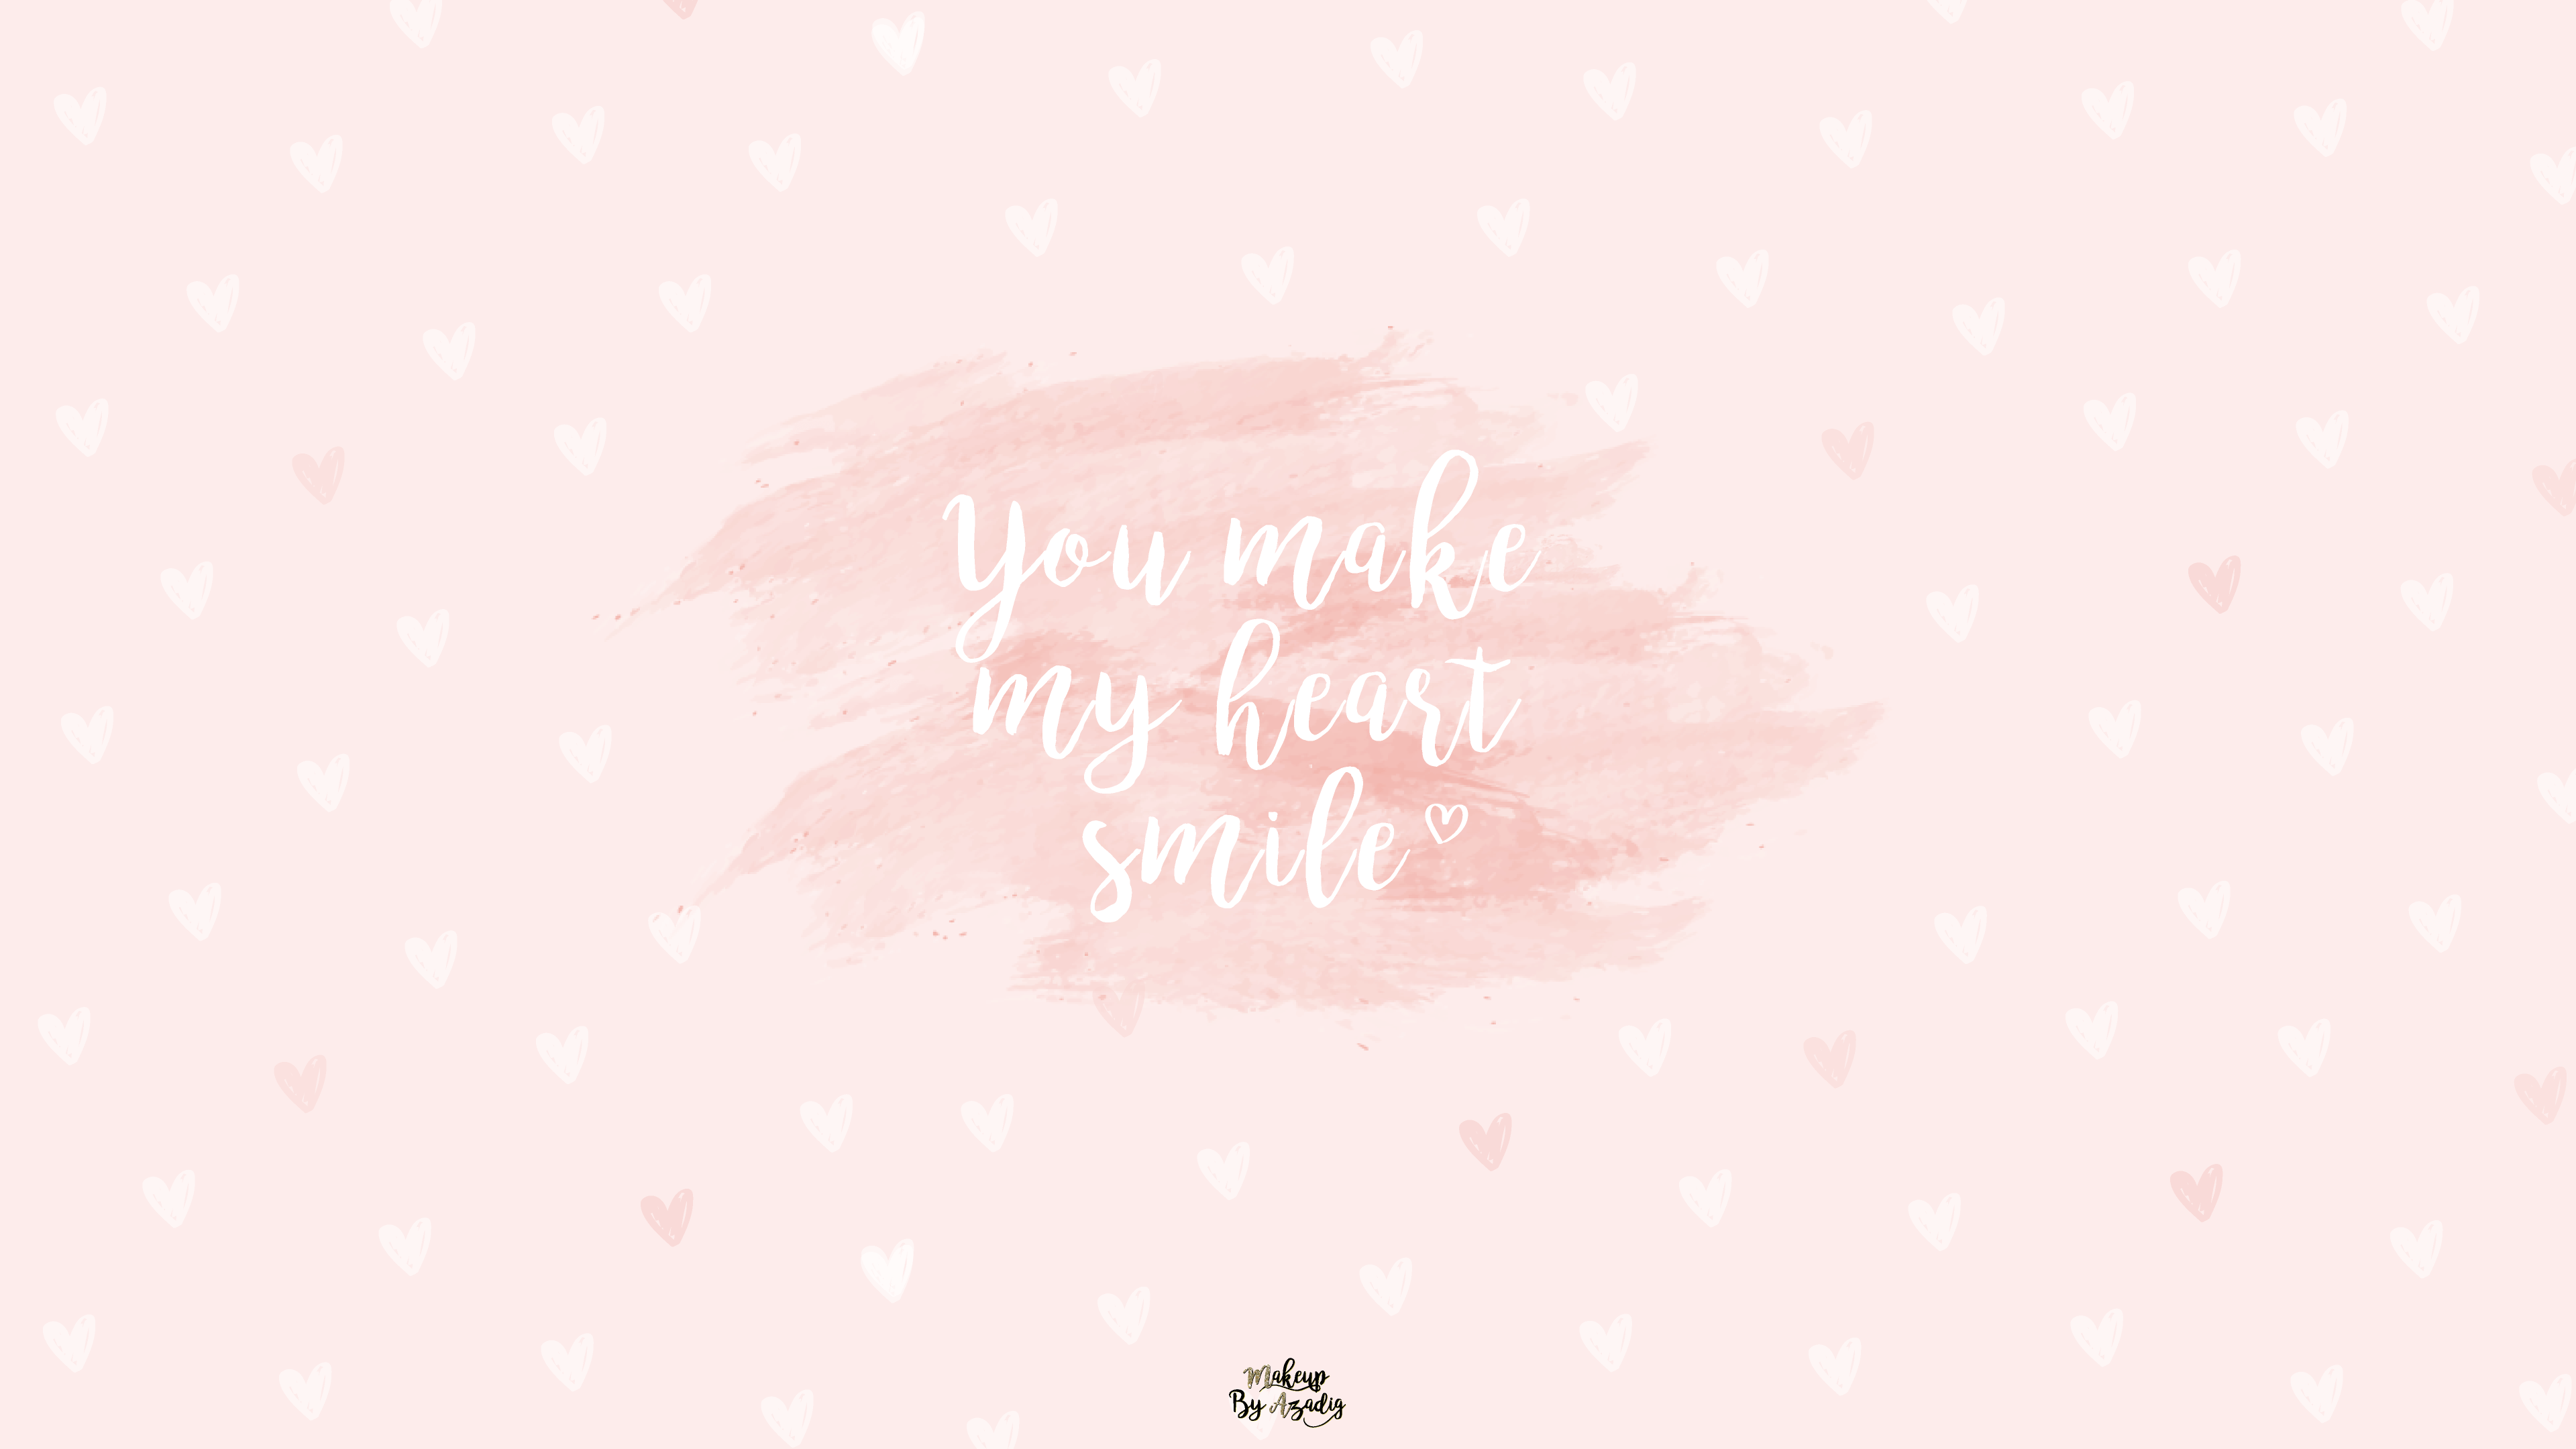 fond-decran-wallpaper-coeur-love-amour-citation-you-make-my-heart-smile-rose-girly-ordinateur-mac-macbook-imac-pc-makeupbyazadig-tendance